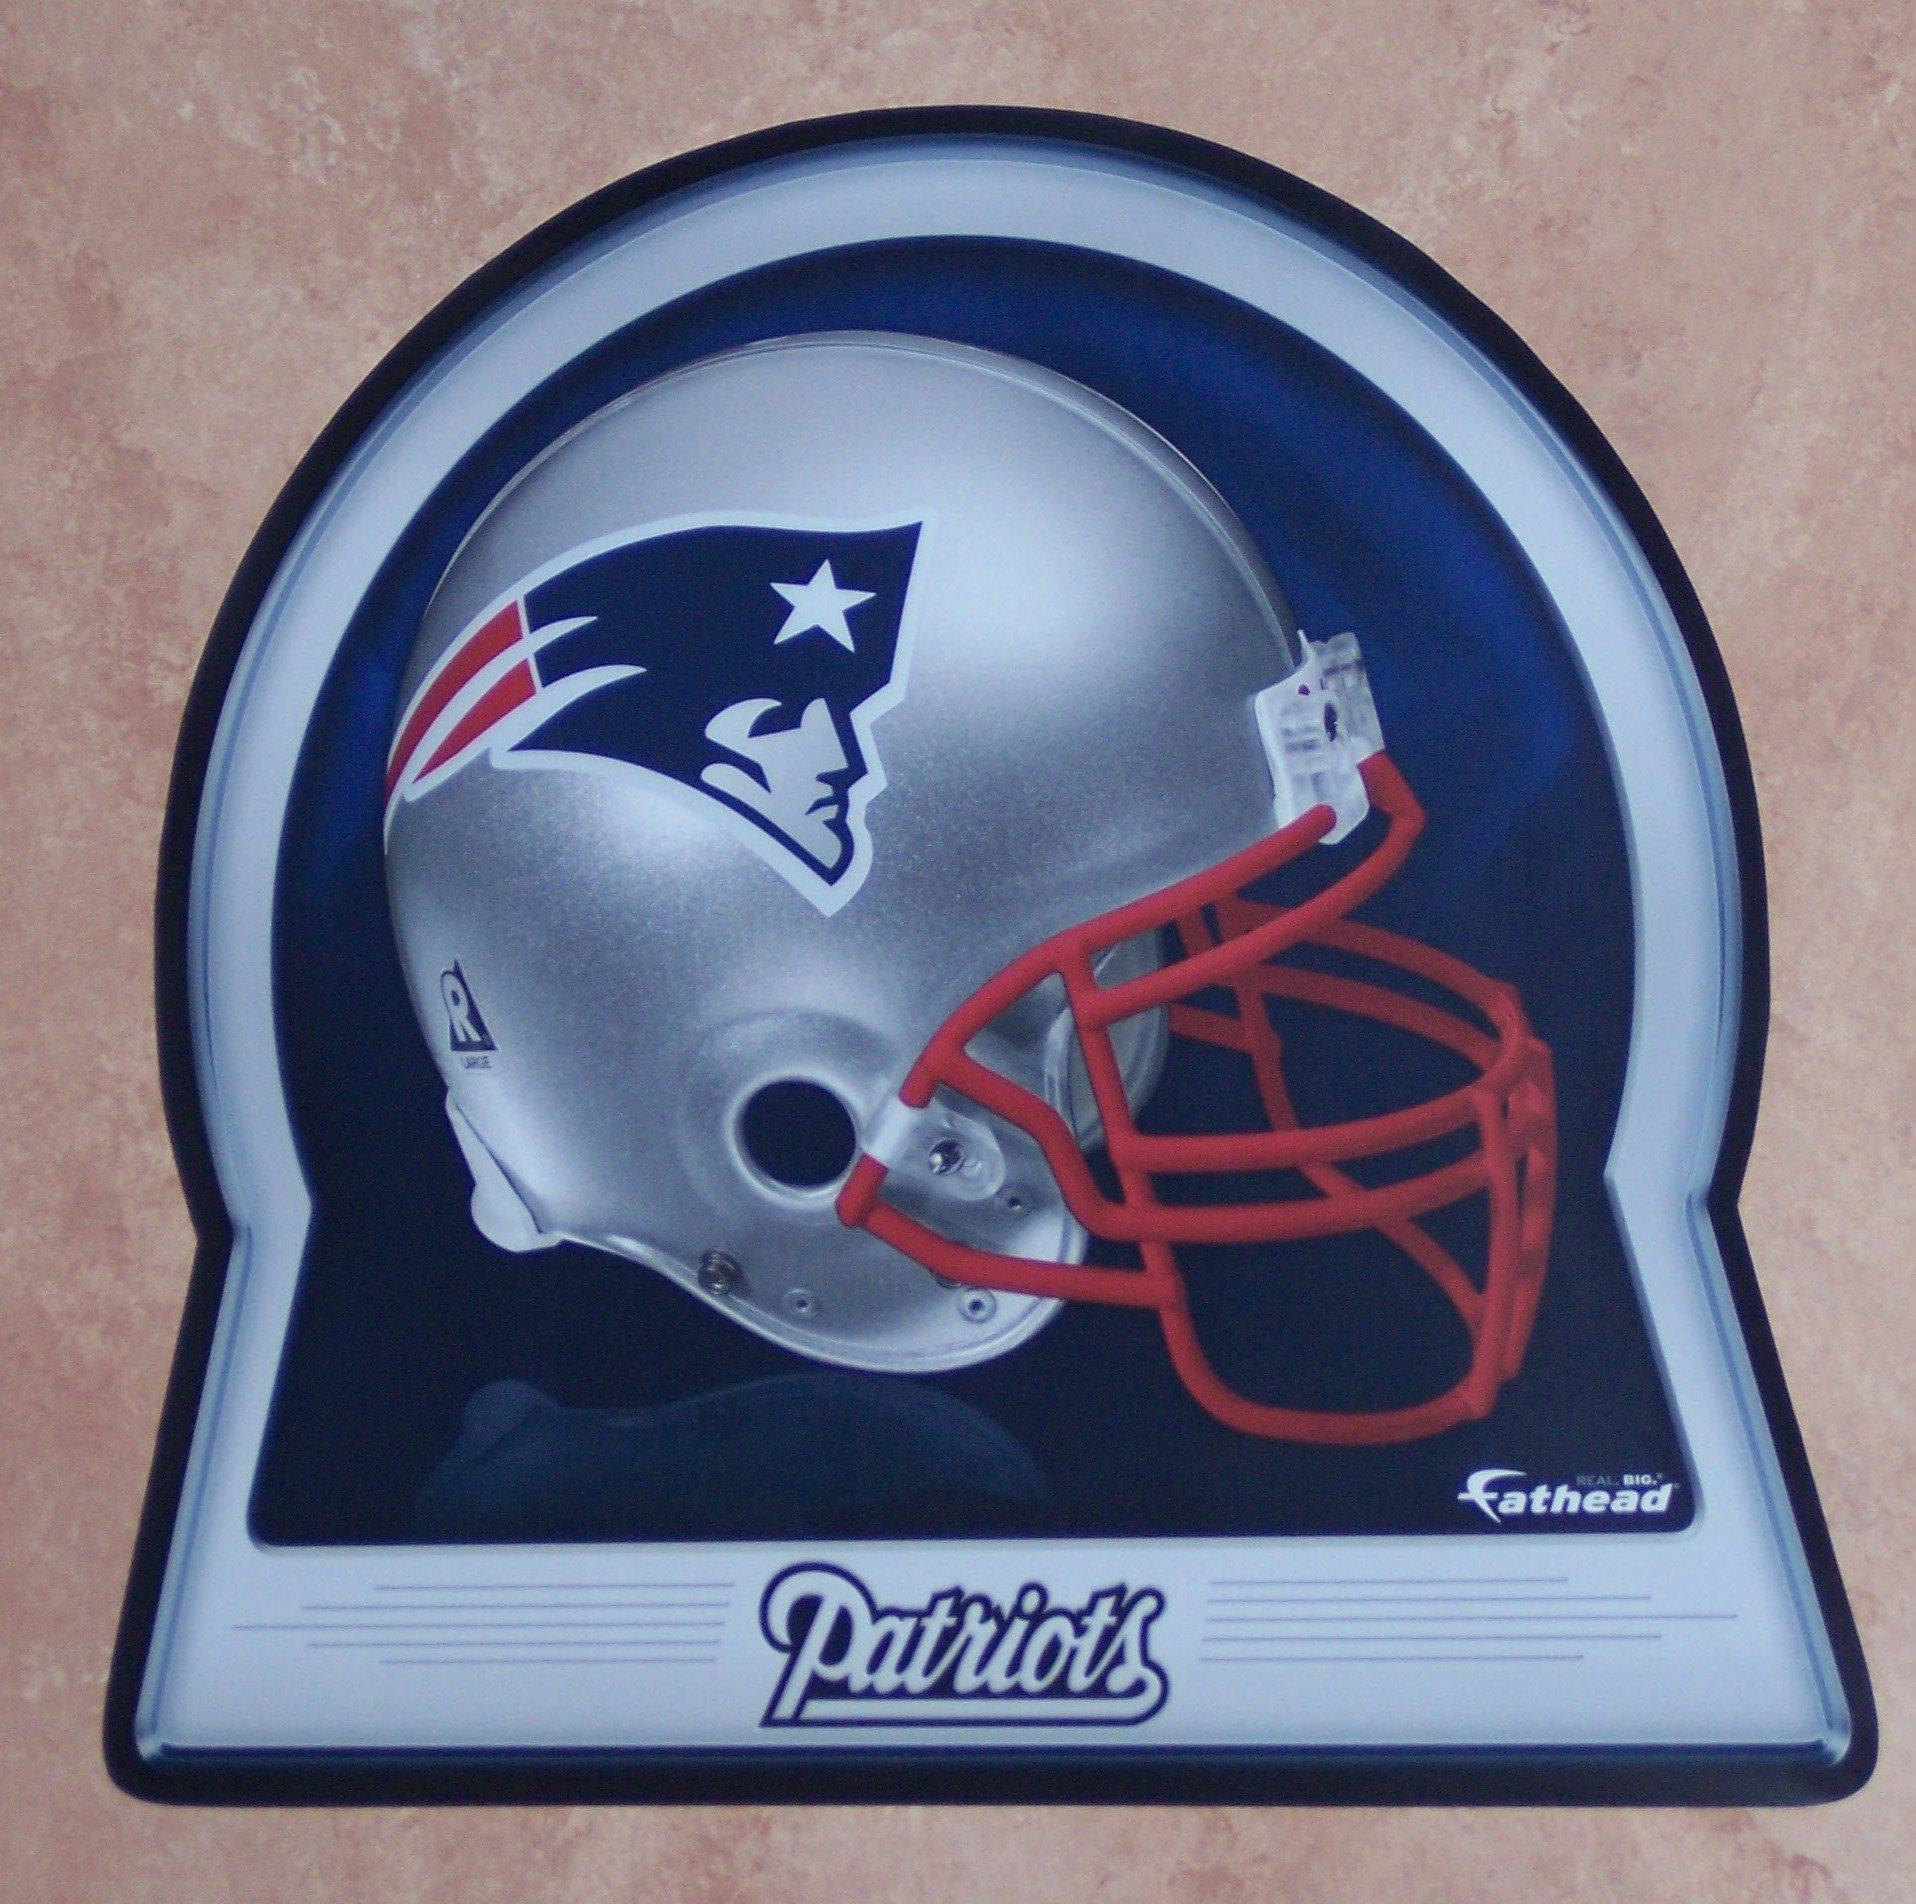 "New England Patriots FATHEAD Team Helmet Logo Official NFL Vinyl Wall Graphic 12""x10"" INCH"